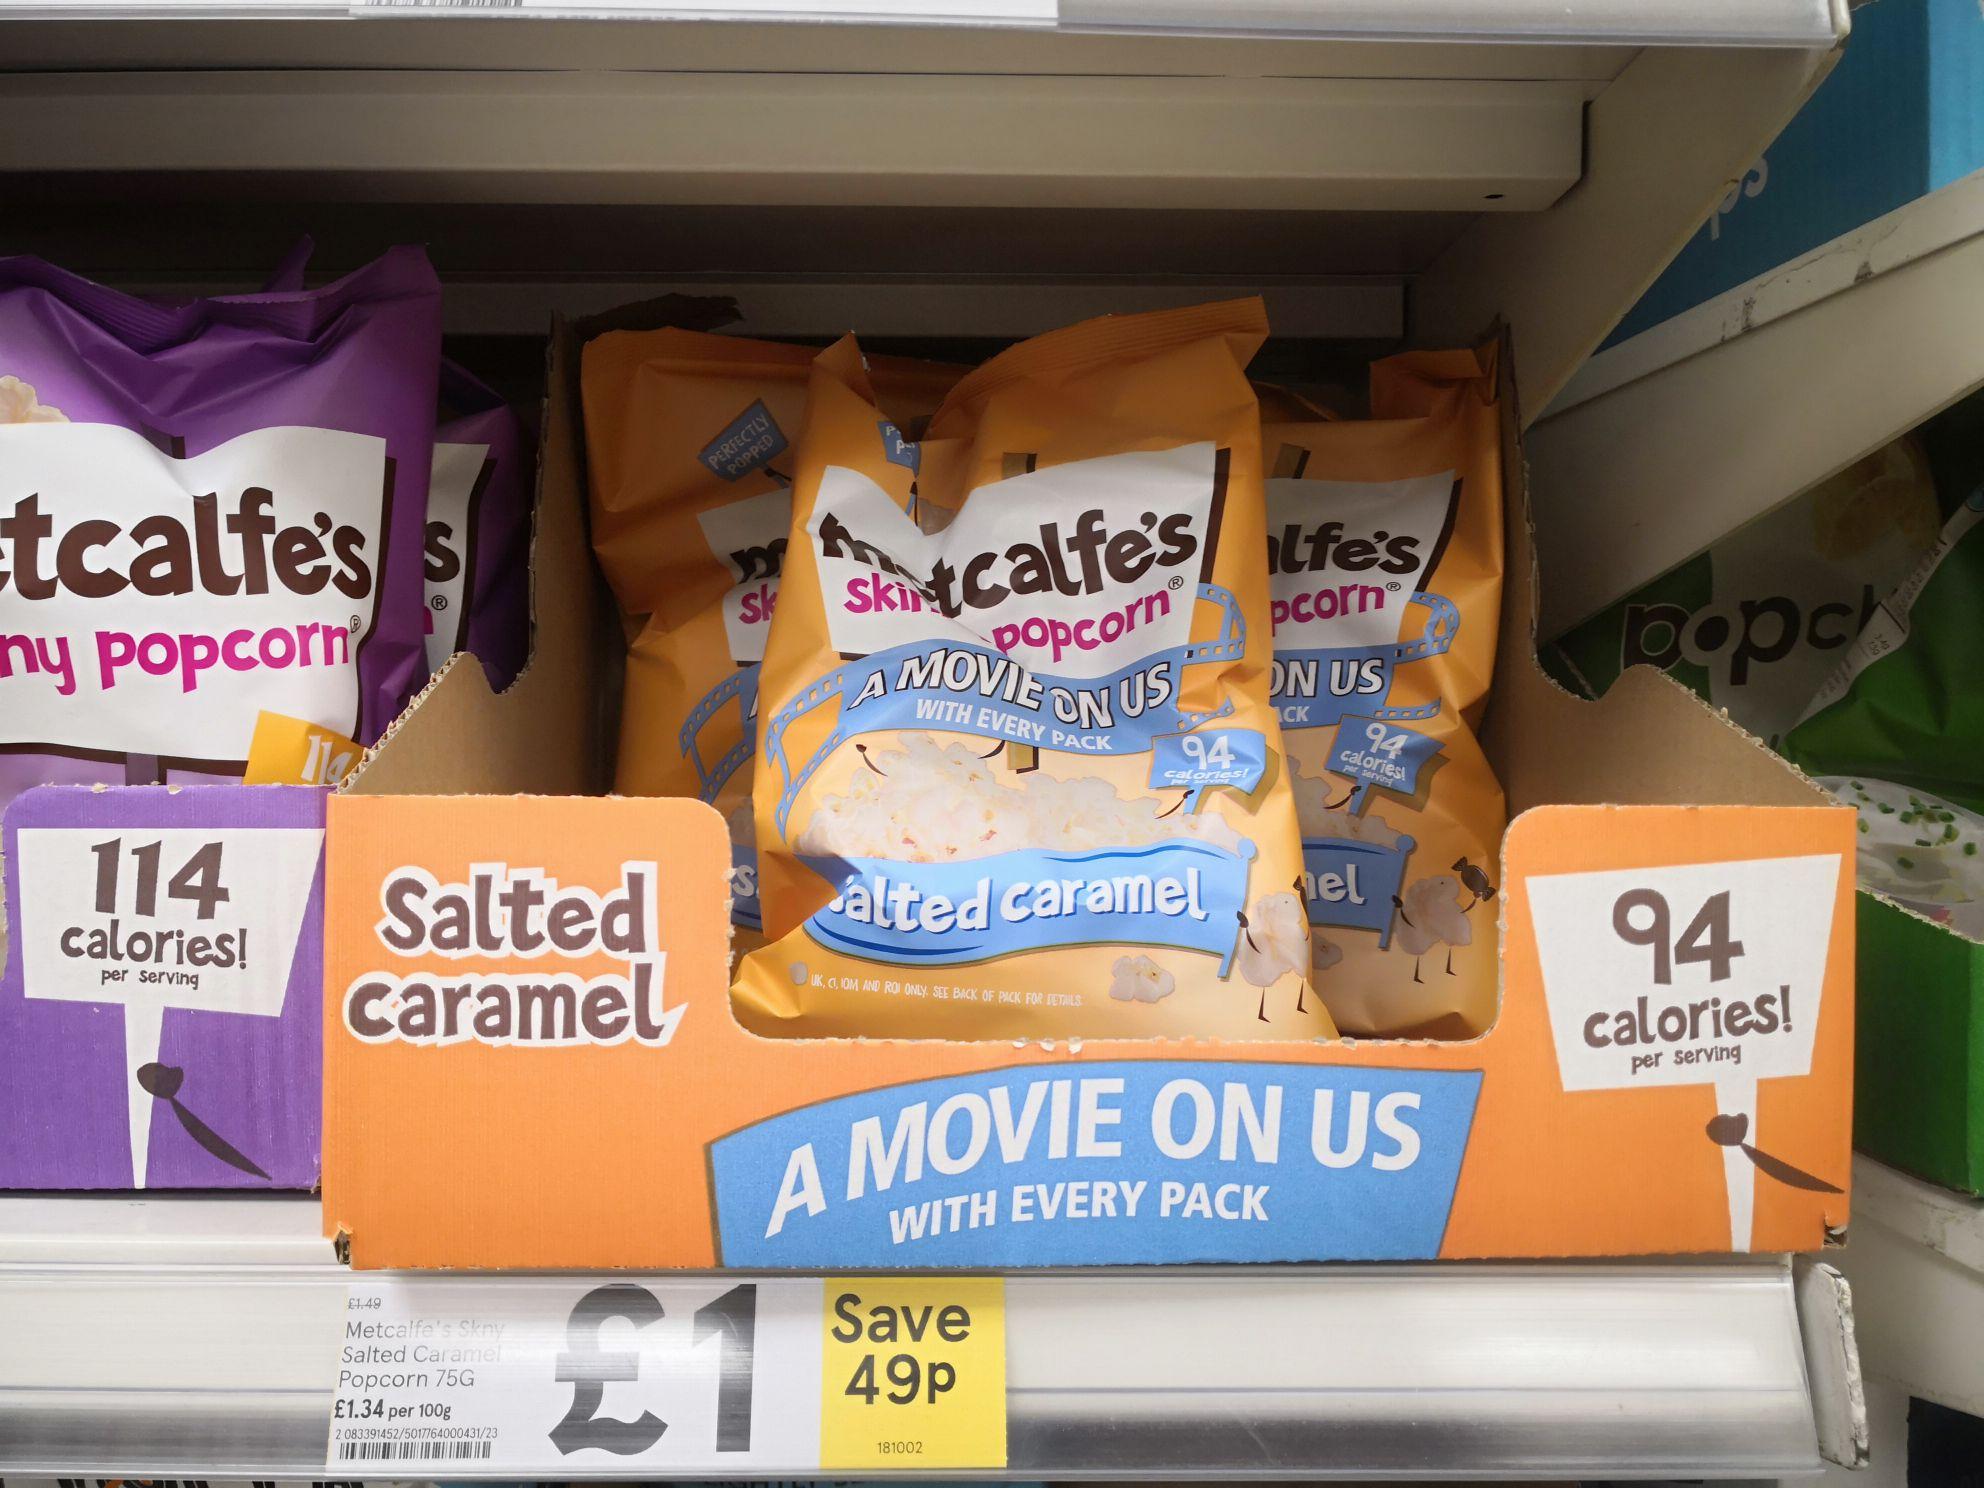 Free Movie Rental (250 Rakuten Points) When Purchasing Metcalfe's Skinny Popcorn £1 @ Tesco (Read Description)